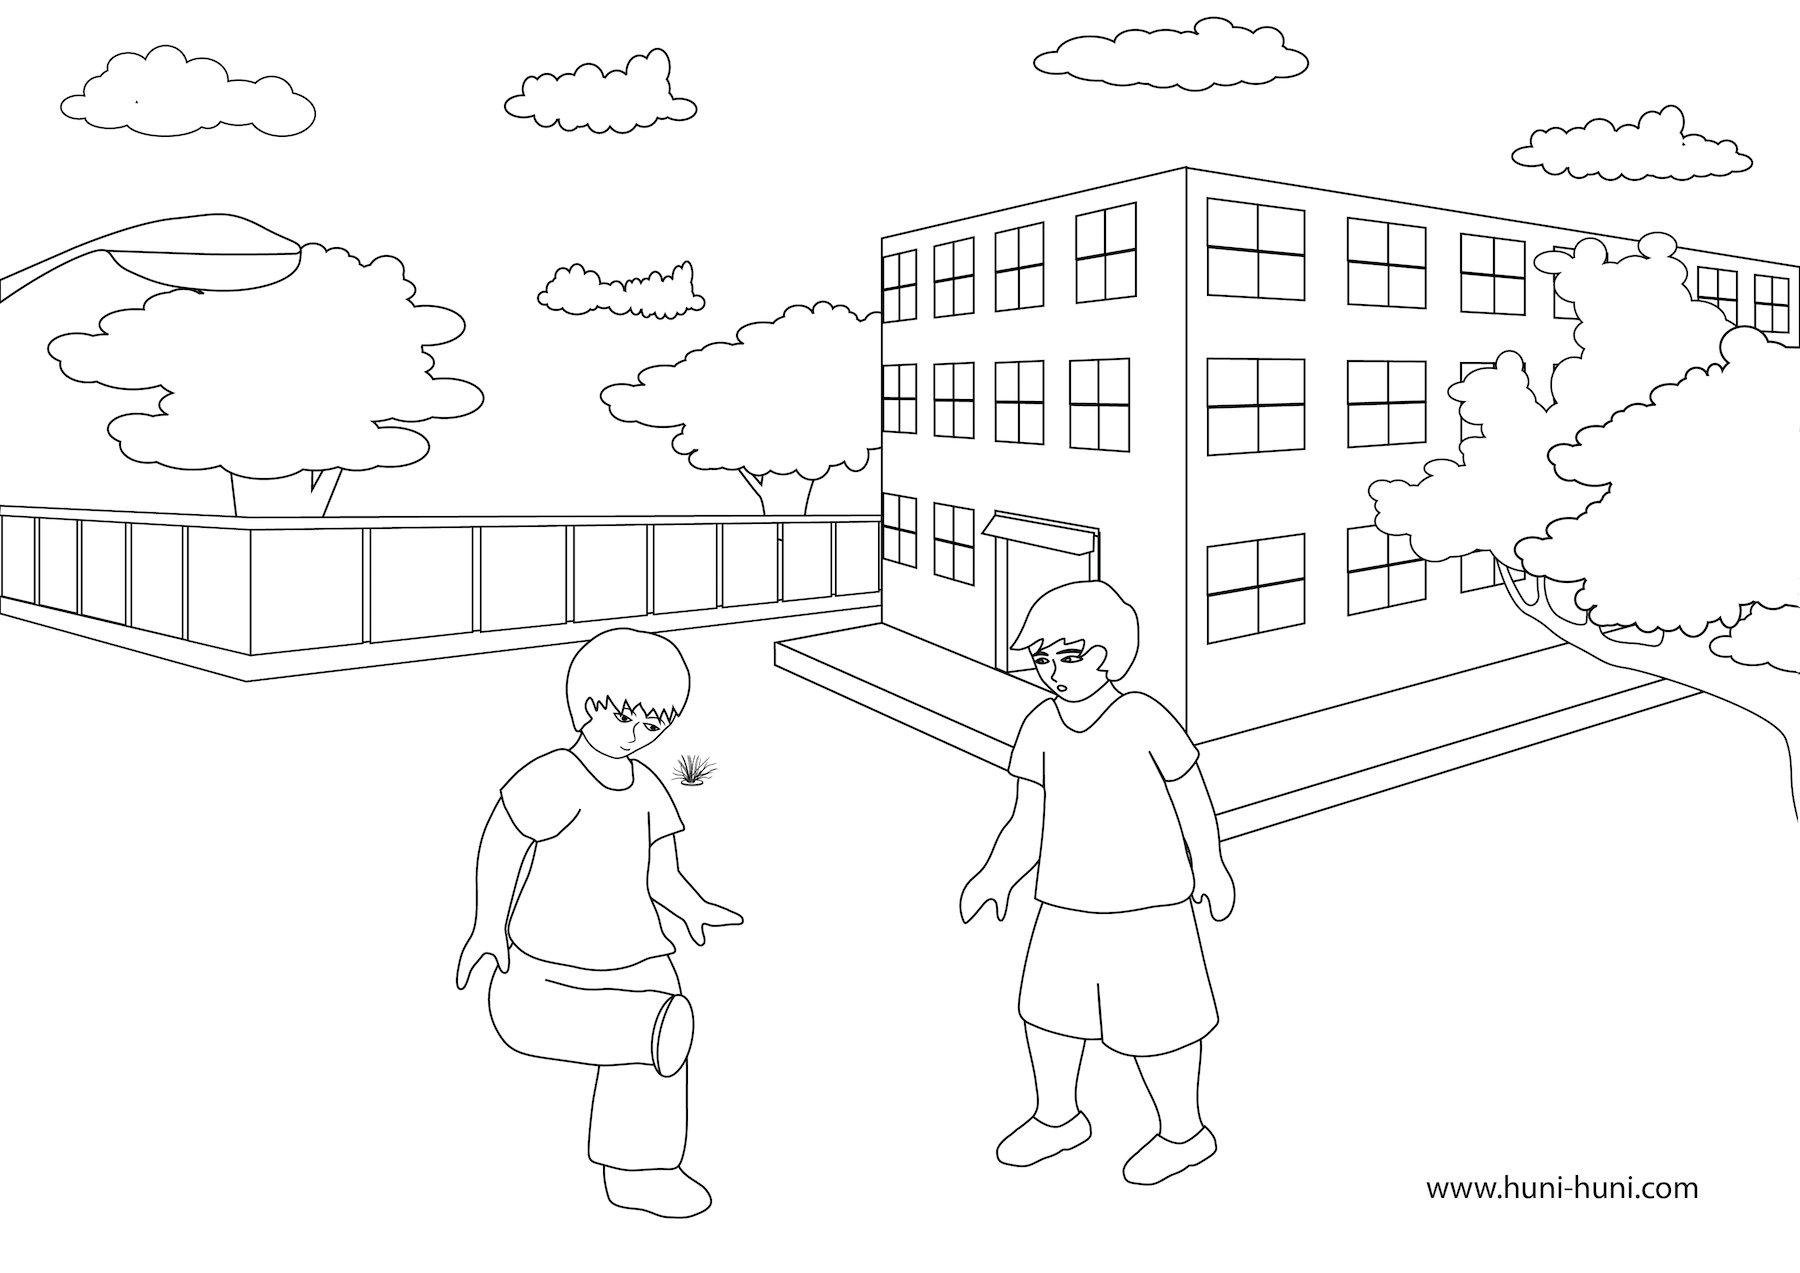 huni-huni-coloring-page-takyan